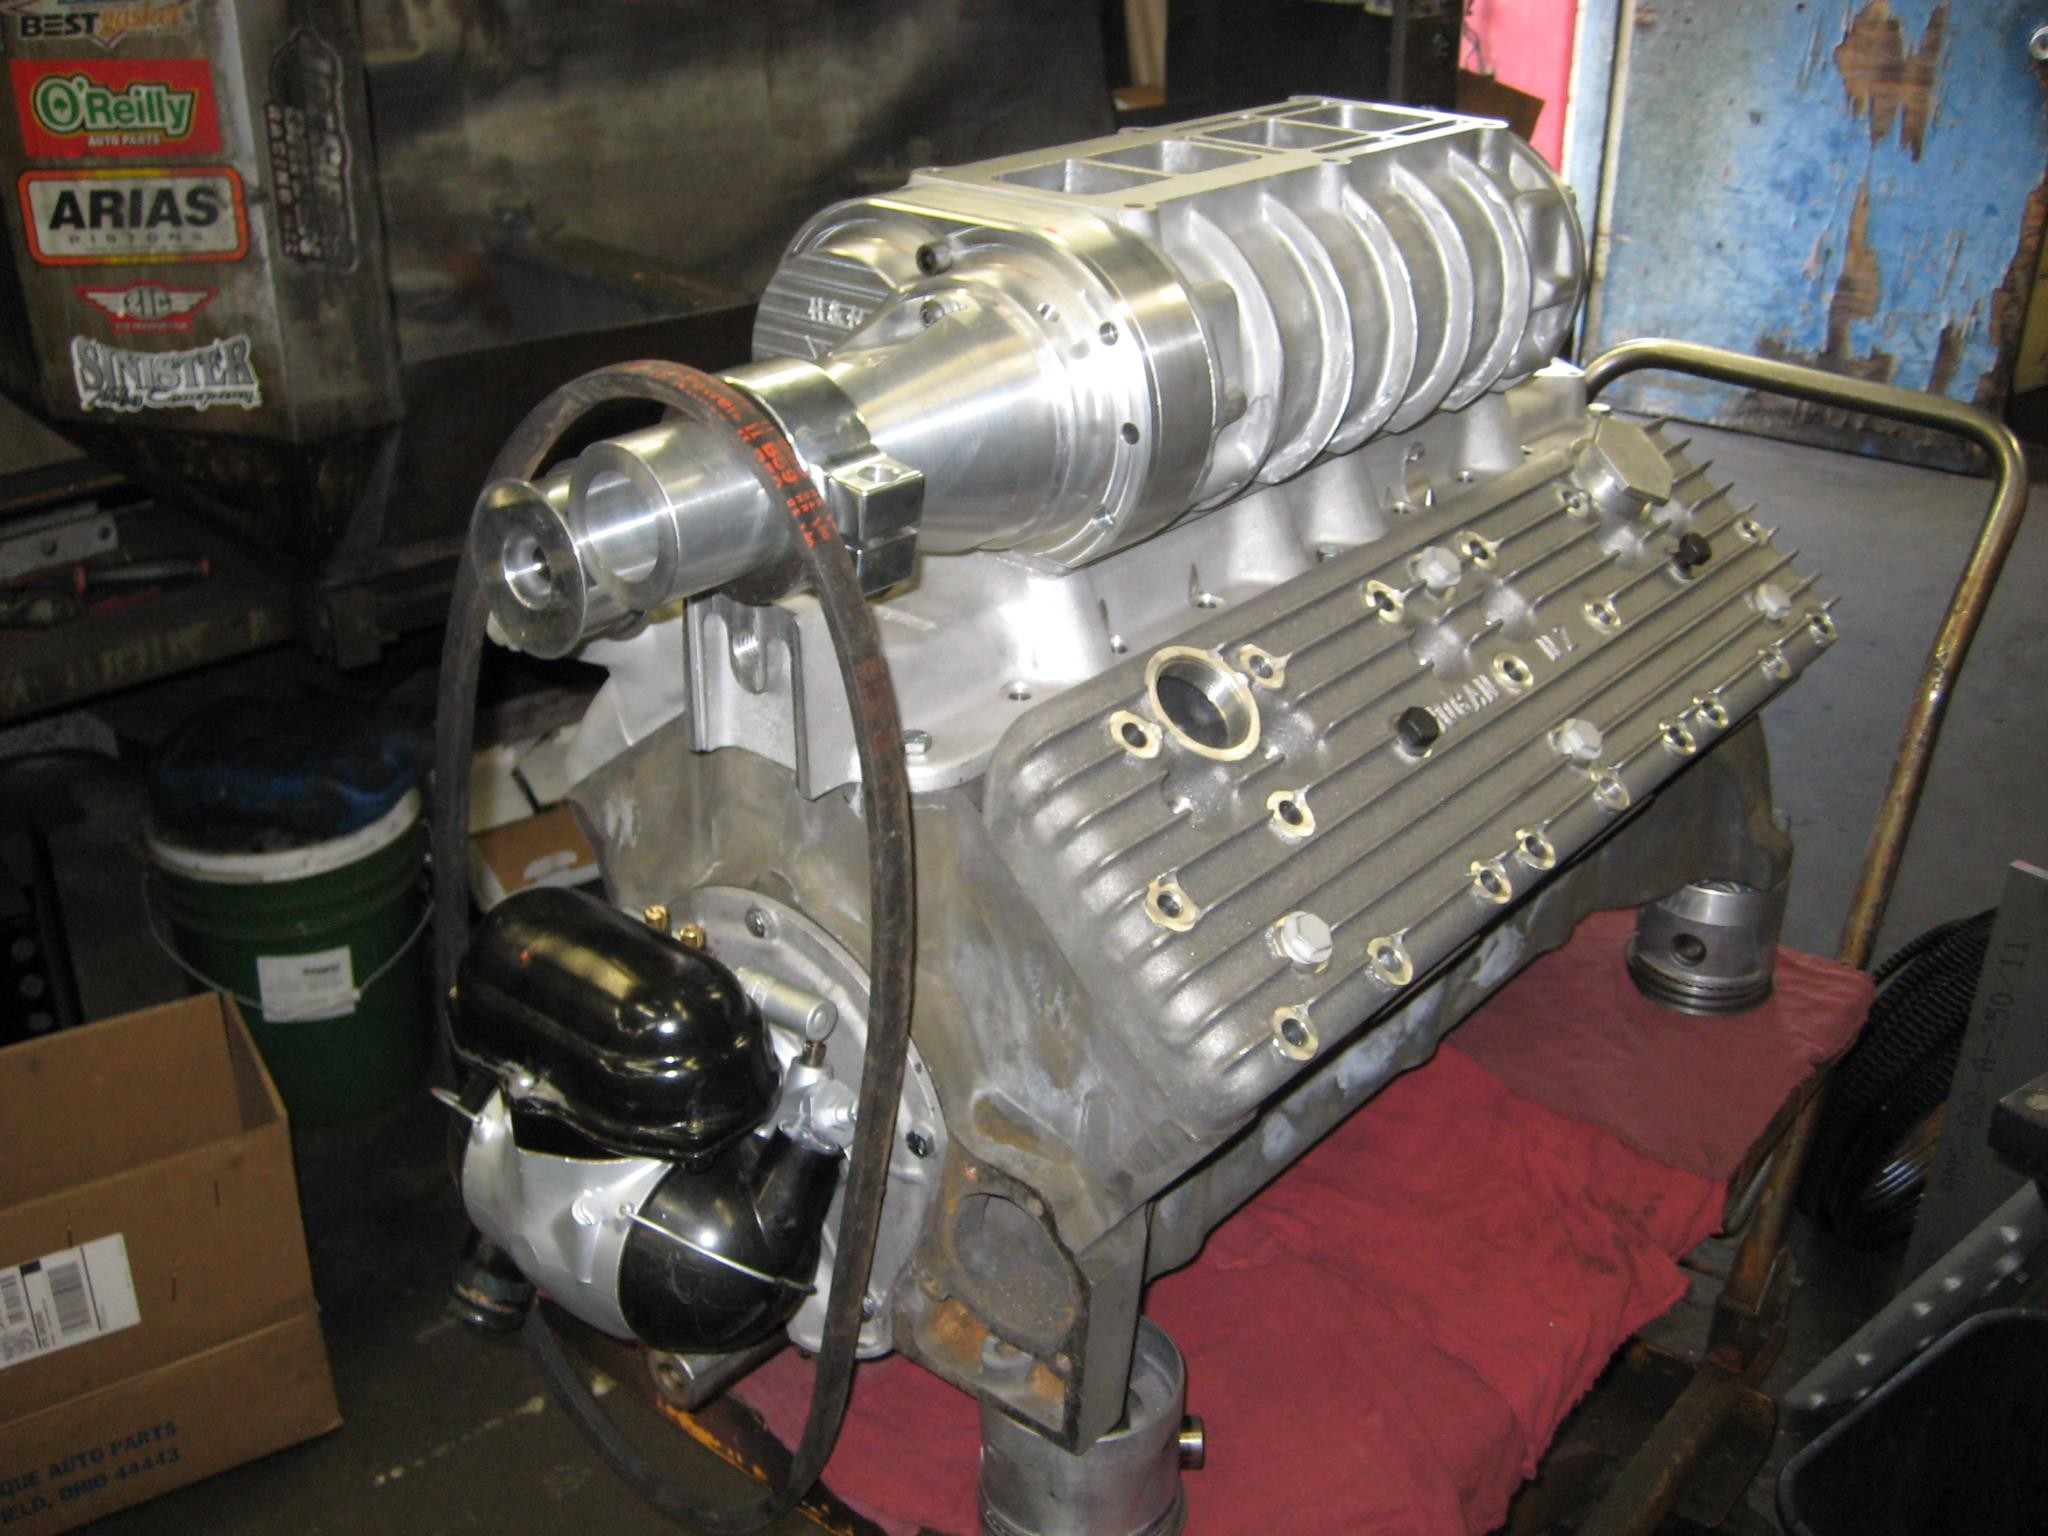 Flathead Engine Diagram Hot Rod Lincoln H&h Flatheads V 12 Lincoln Engines Enginelabs Of Flathead Engine Diagram